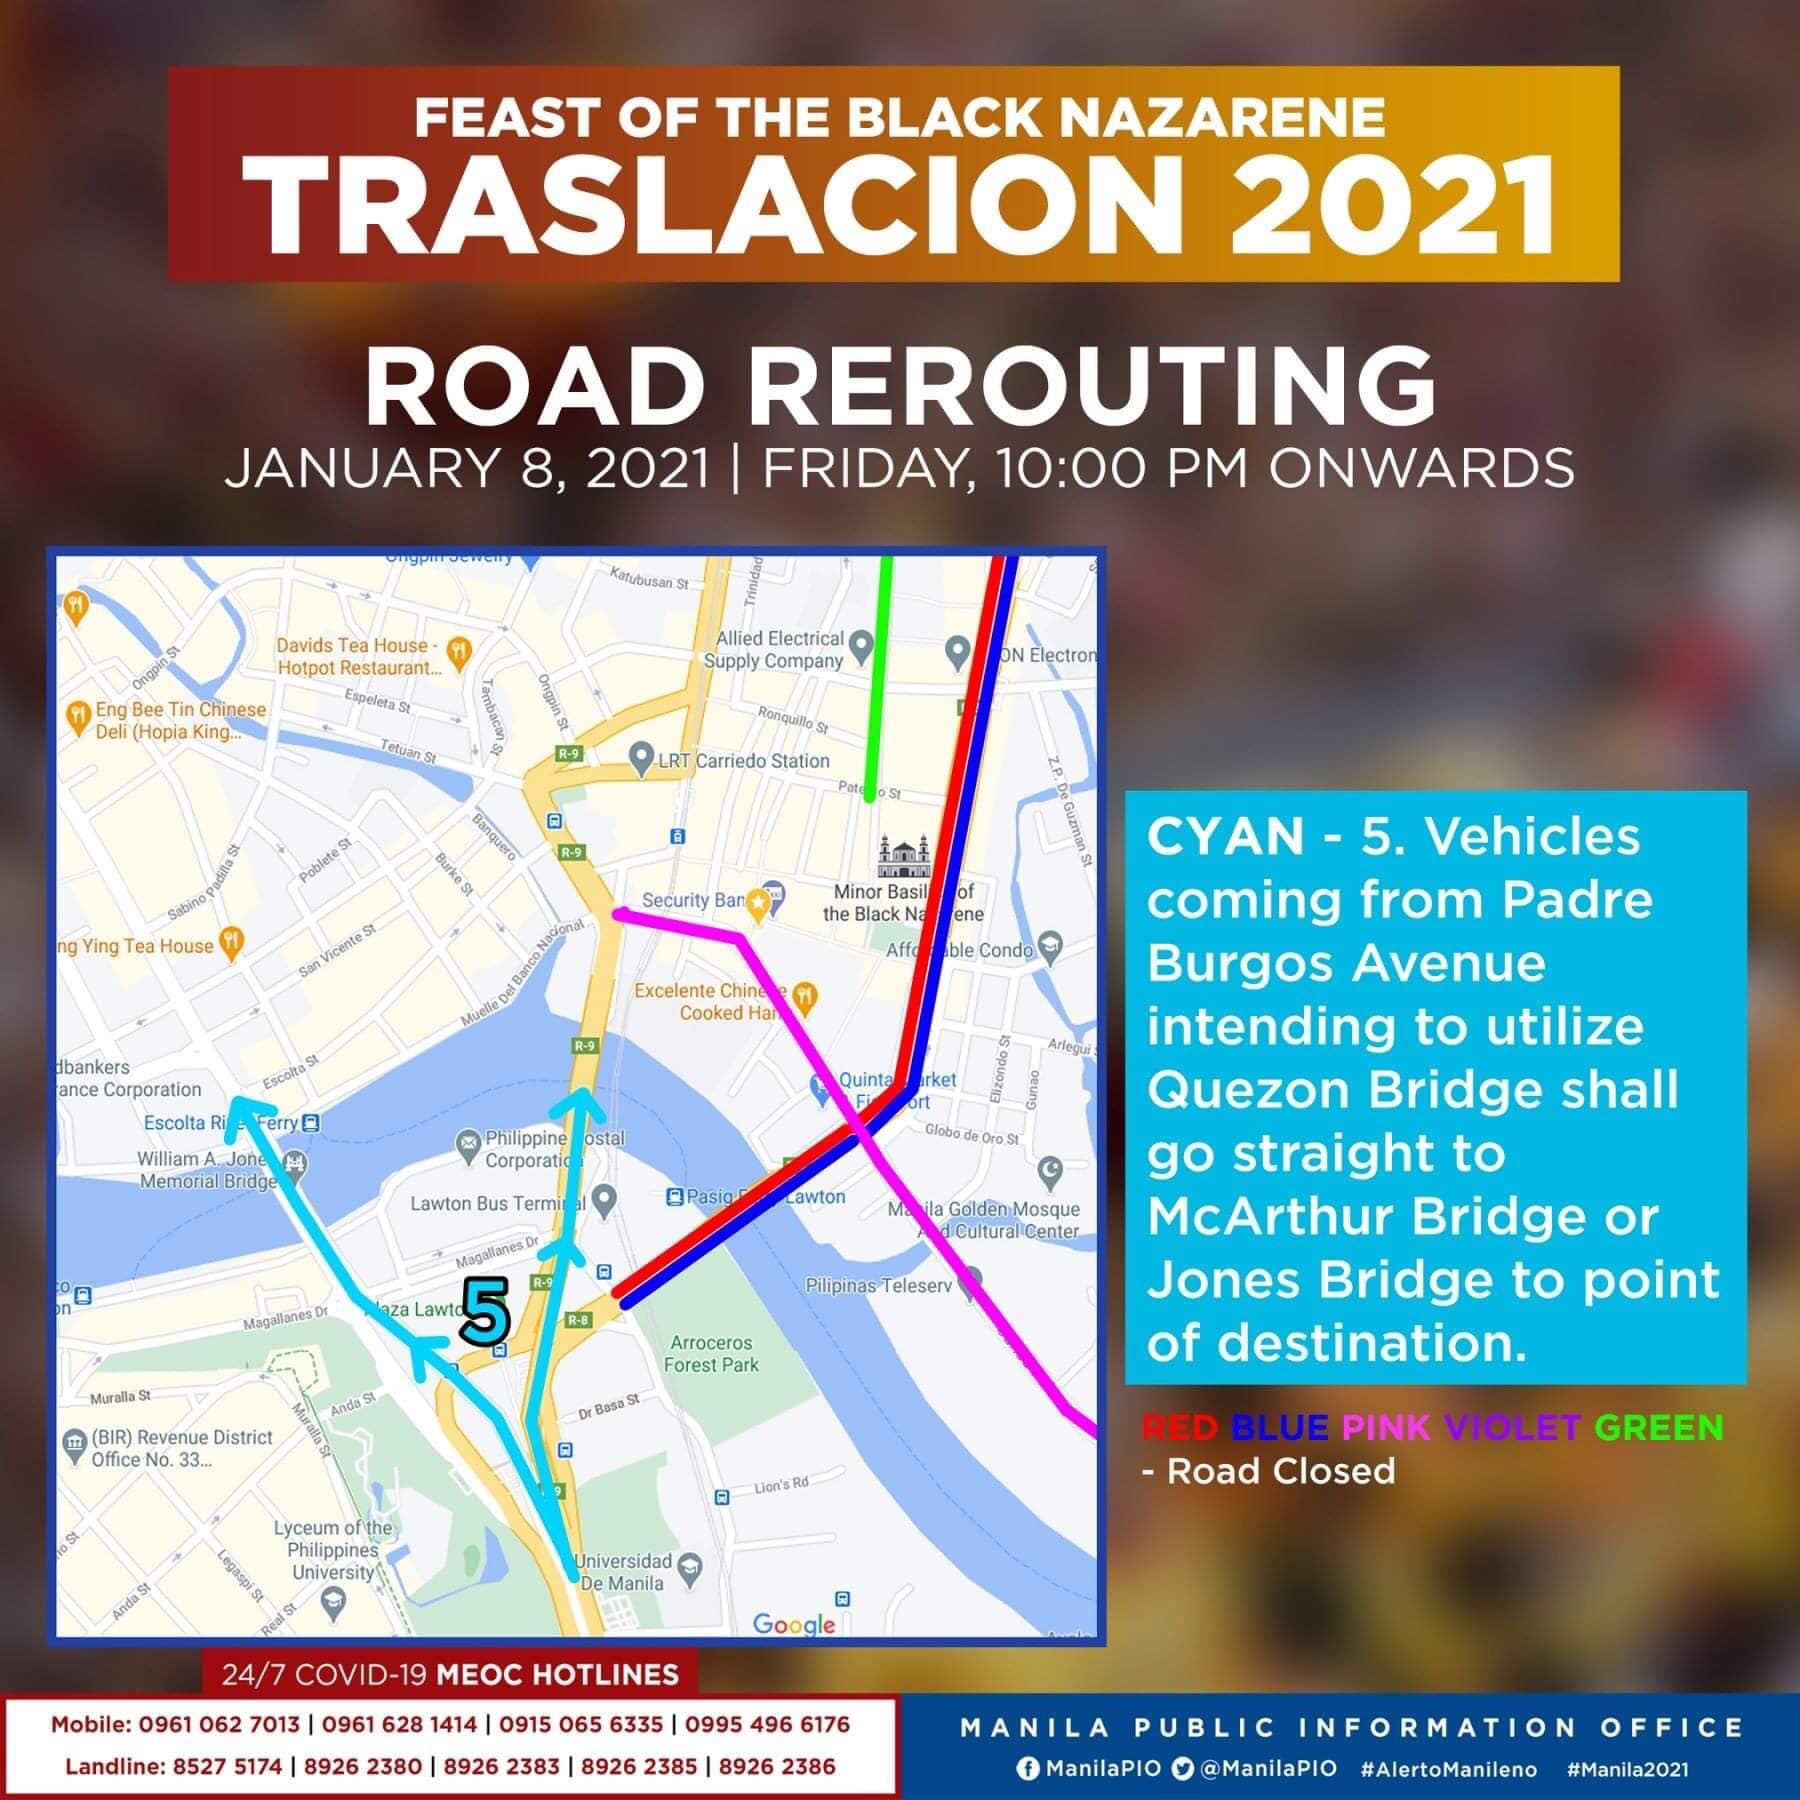 Traslacion Road rerouting on January 8, 2021 (10 pm onwards) - McArthur Bridge